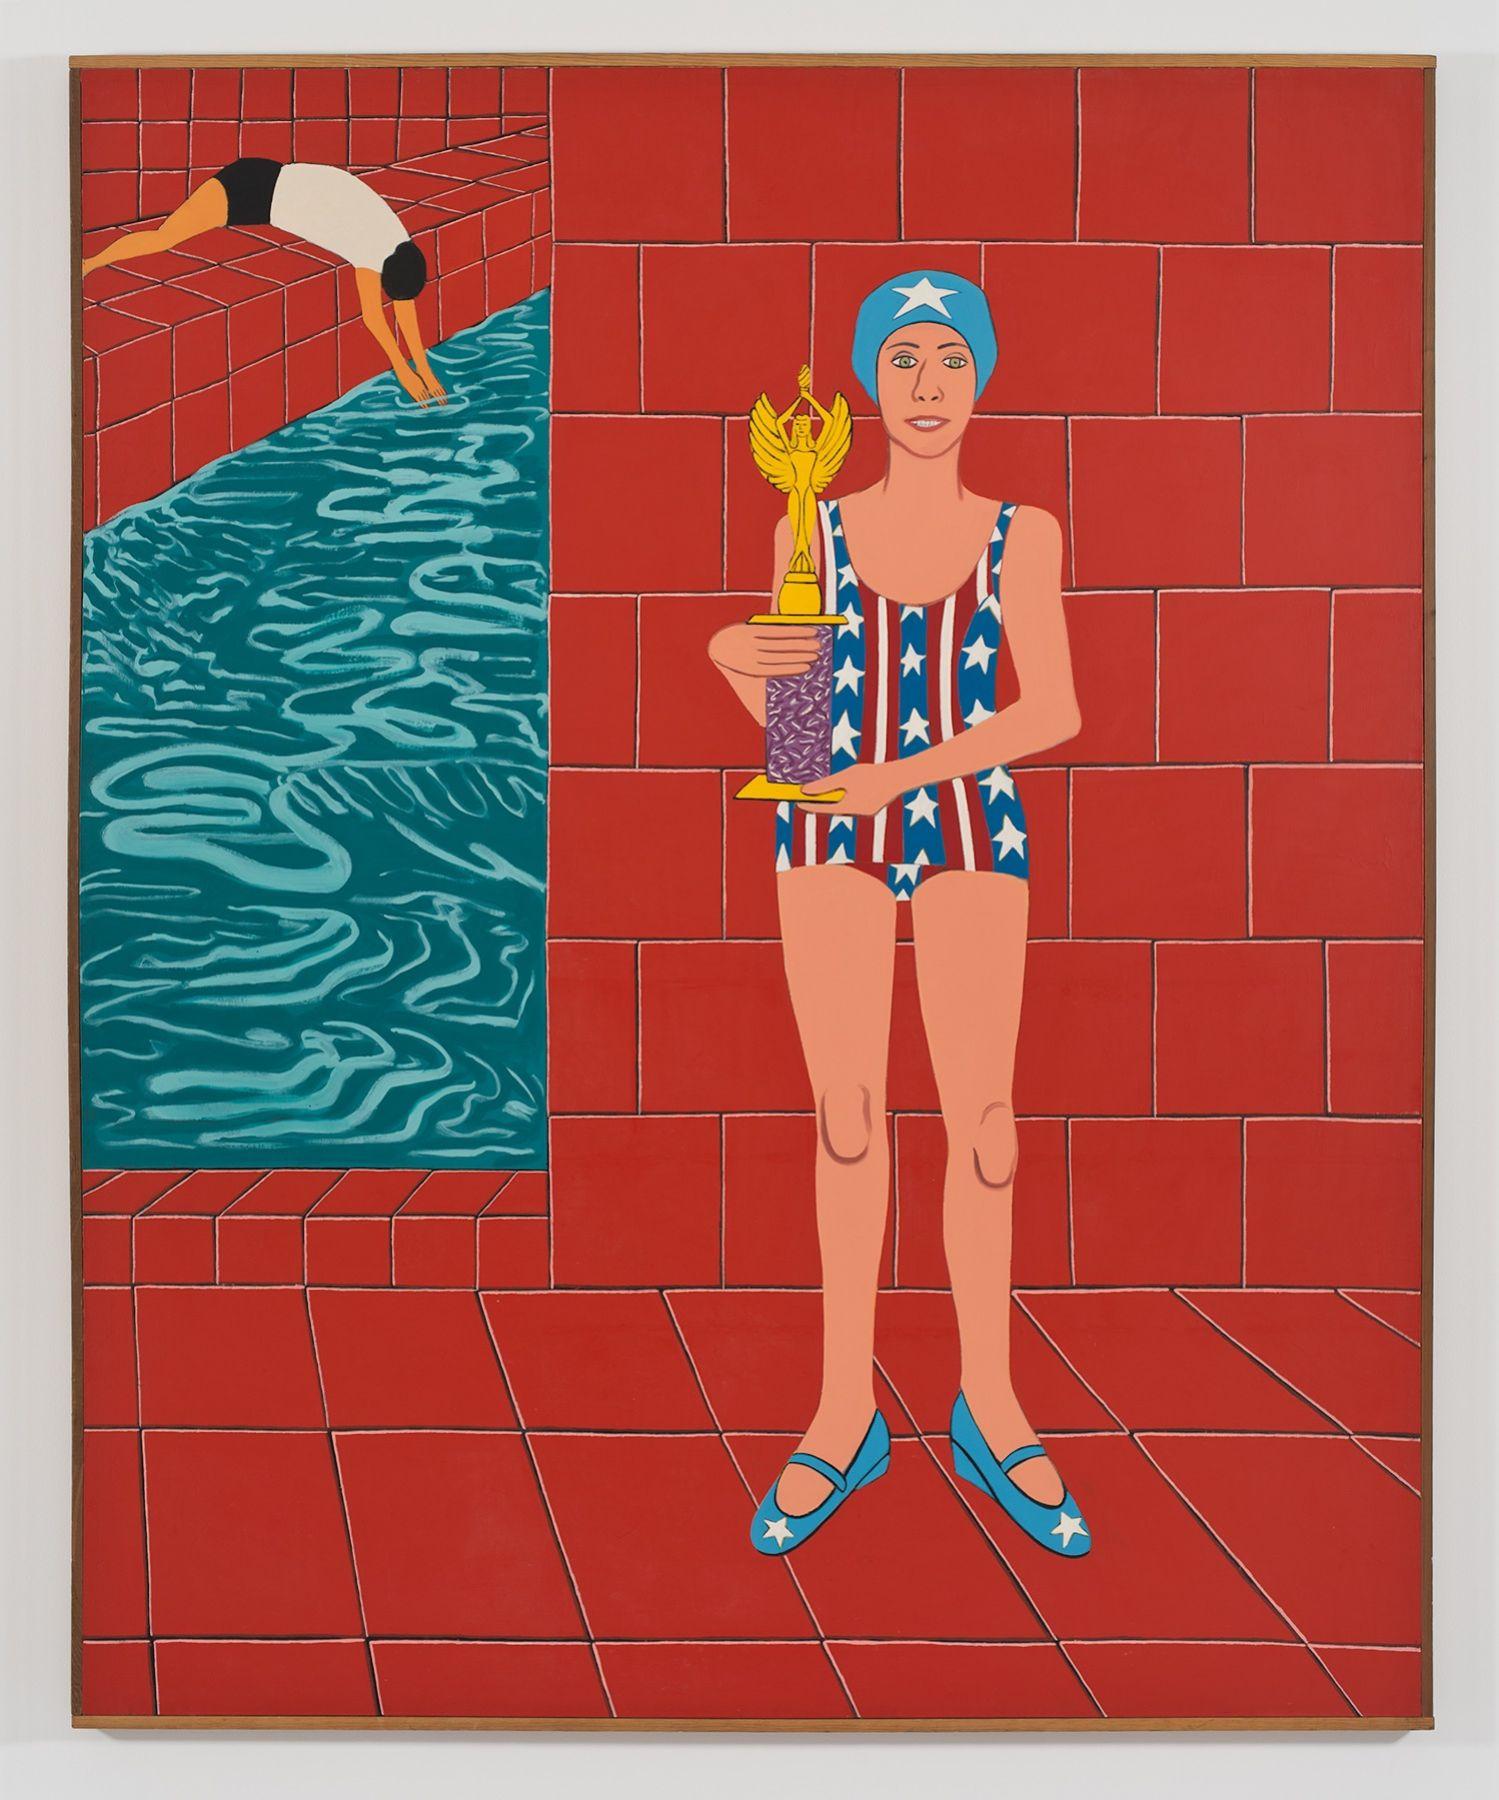 Joan Brown,, The Bicentennial Champion, 1976